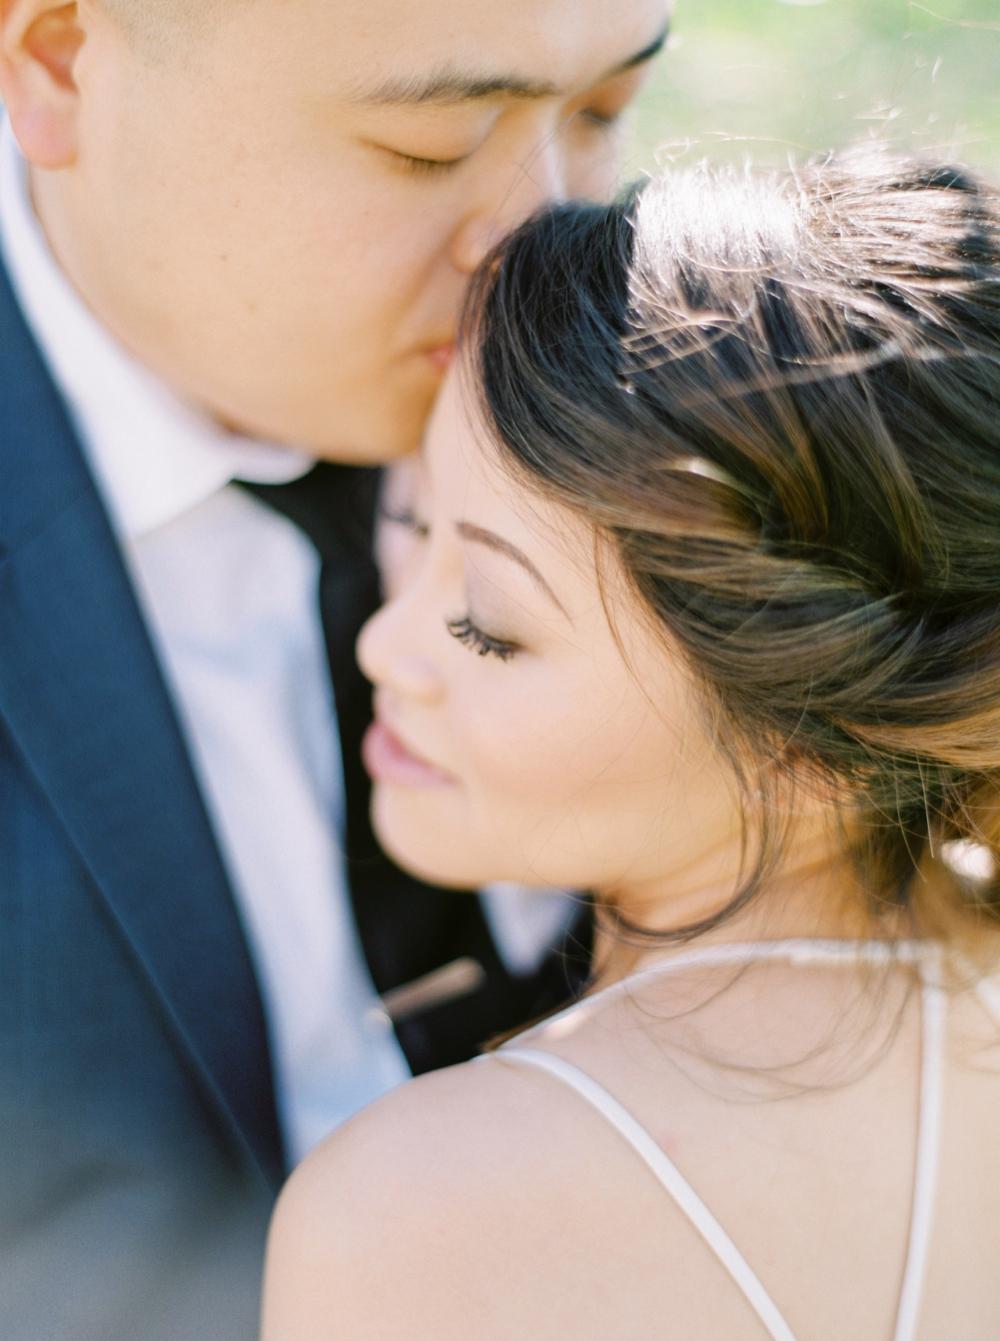 Bride and groom portraits | BHLDN wedding dress | Justine milton fine art wedding photographers | calgary wedding at the lake house